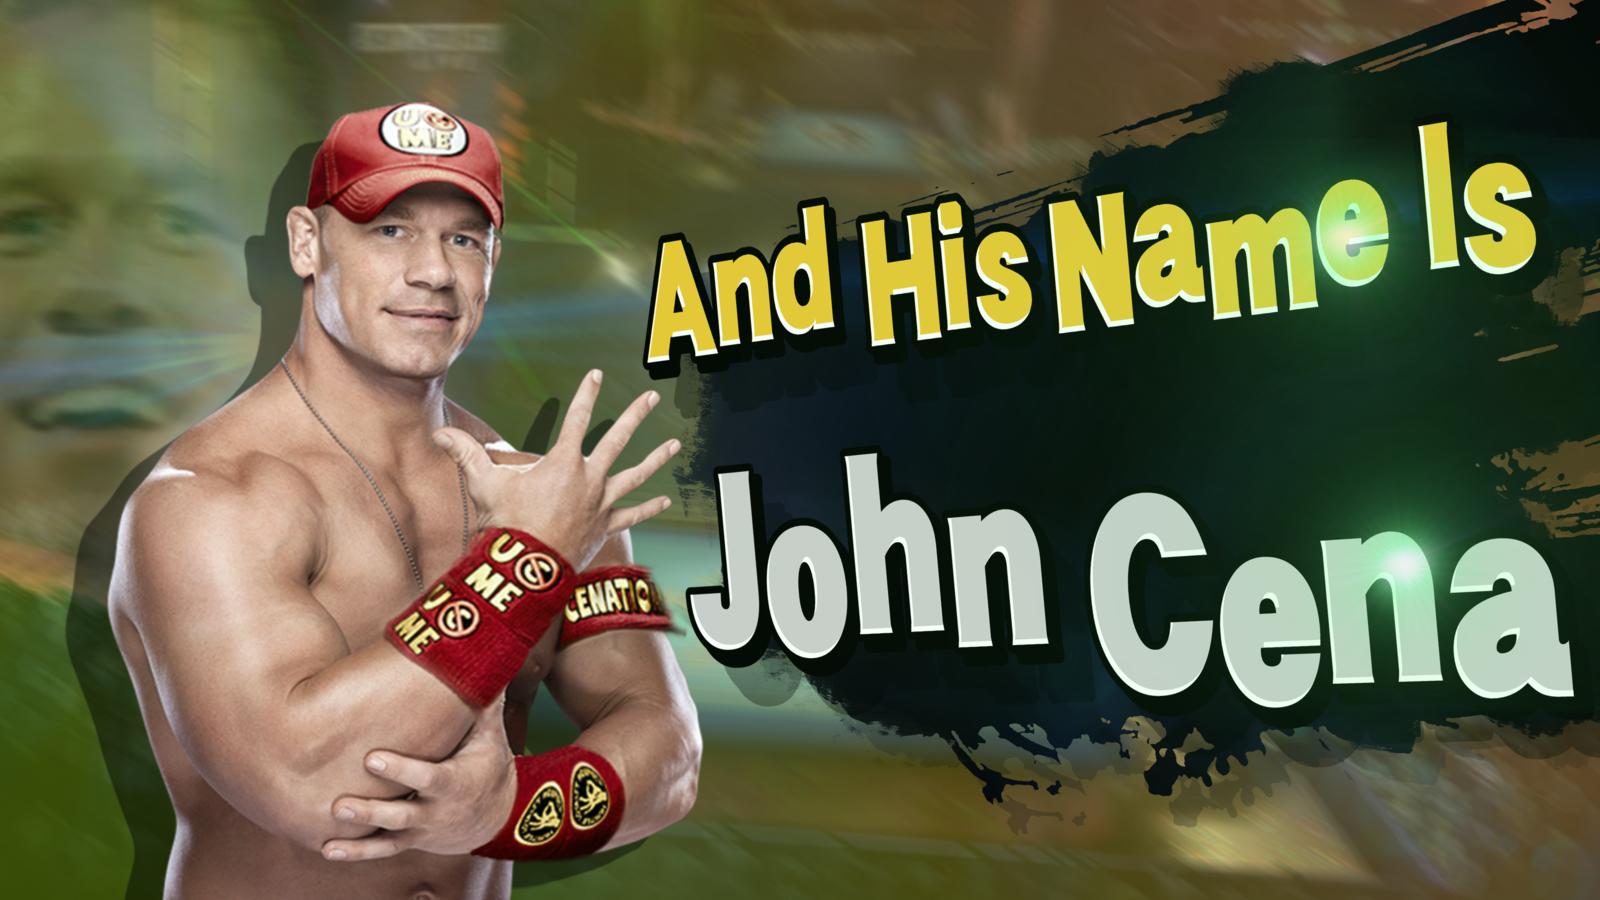 And His Name Is John Cena! - Super Smash Bros  | John Cena